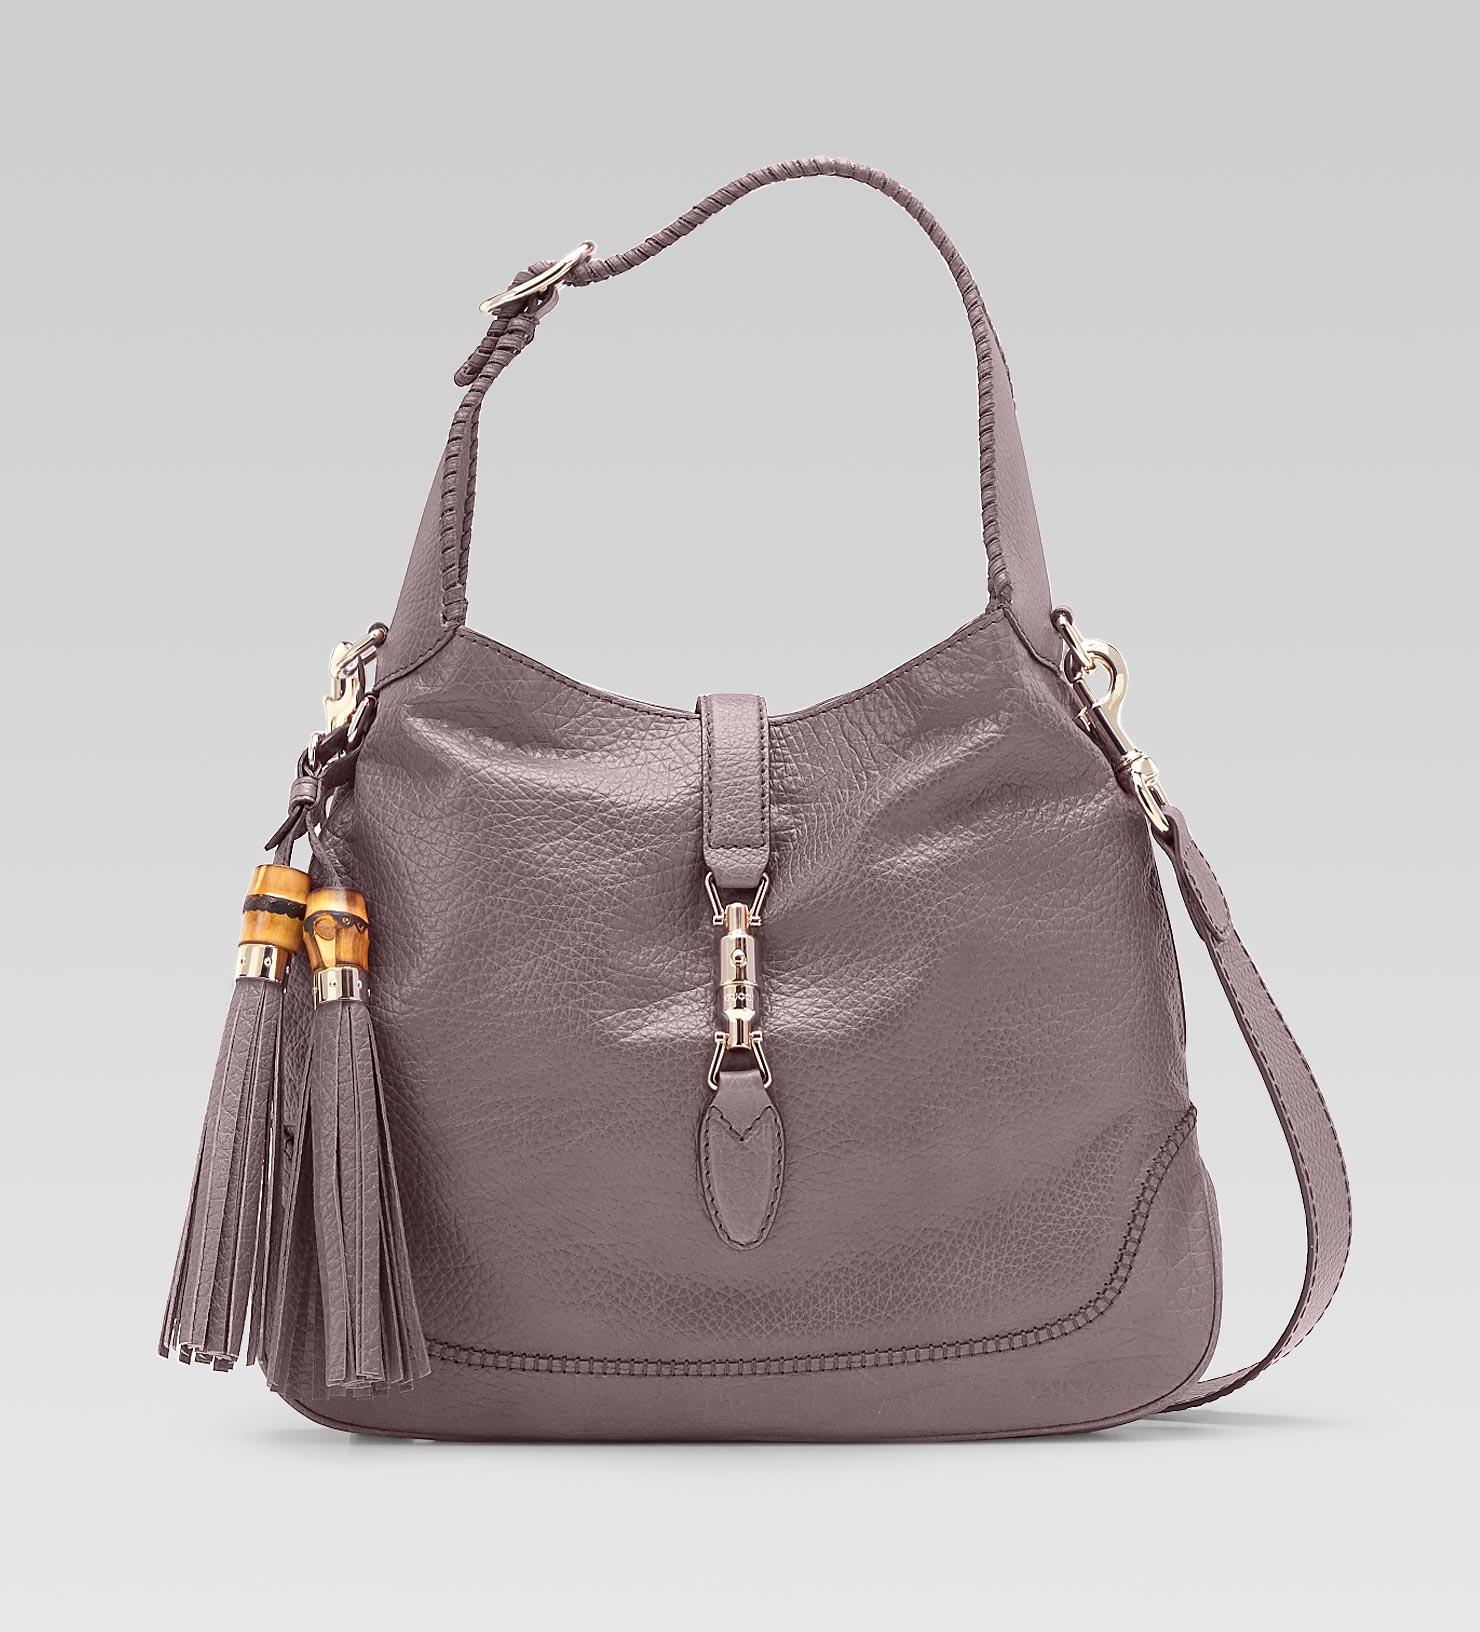 8c8de65df49 Gucci new jackie shoulder bag | Gucci Purse | Leather shoulder bag ...